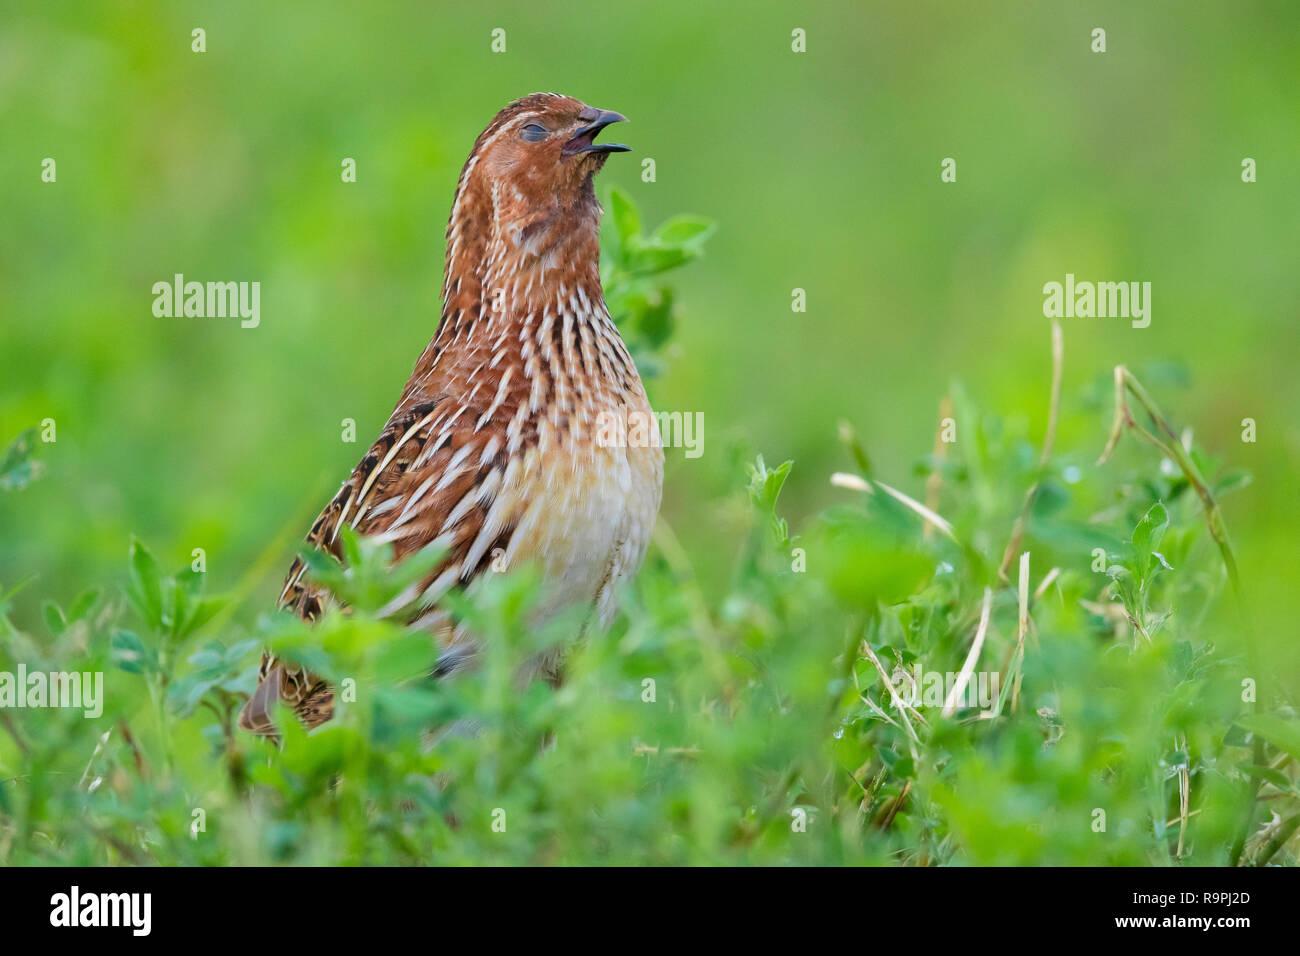 Common Quail (Coturnix coturnix), adult male singing in an Alfalfa field - Stock Image